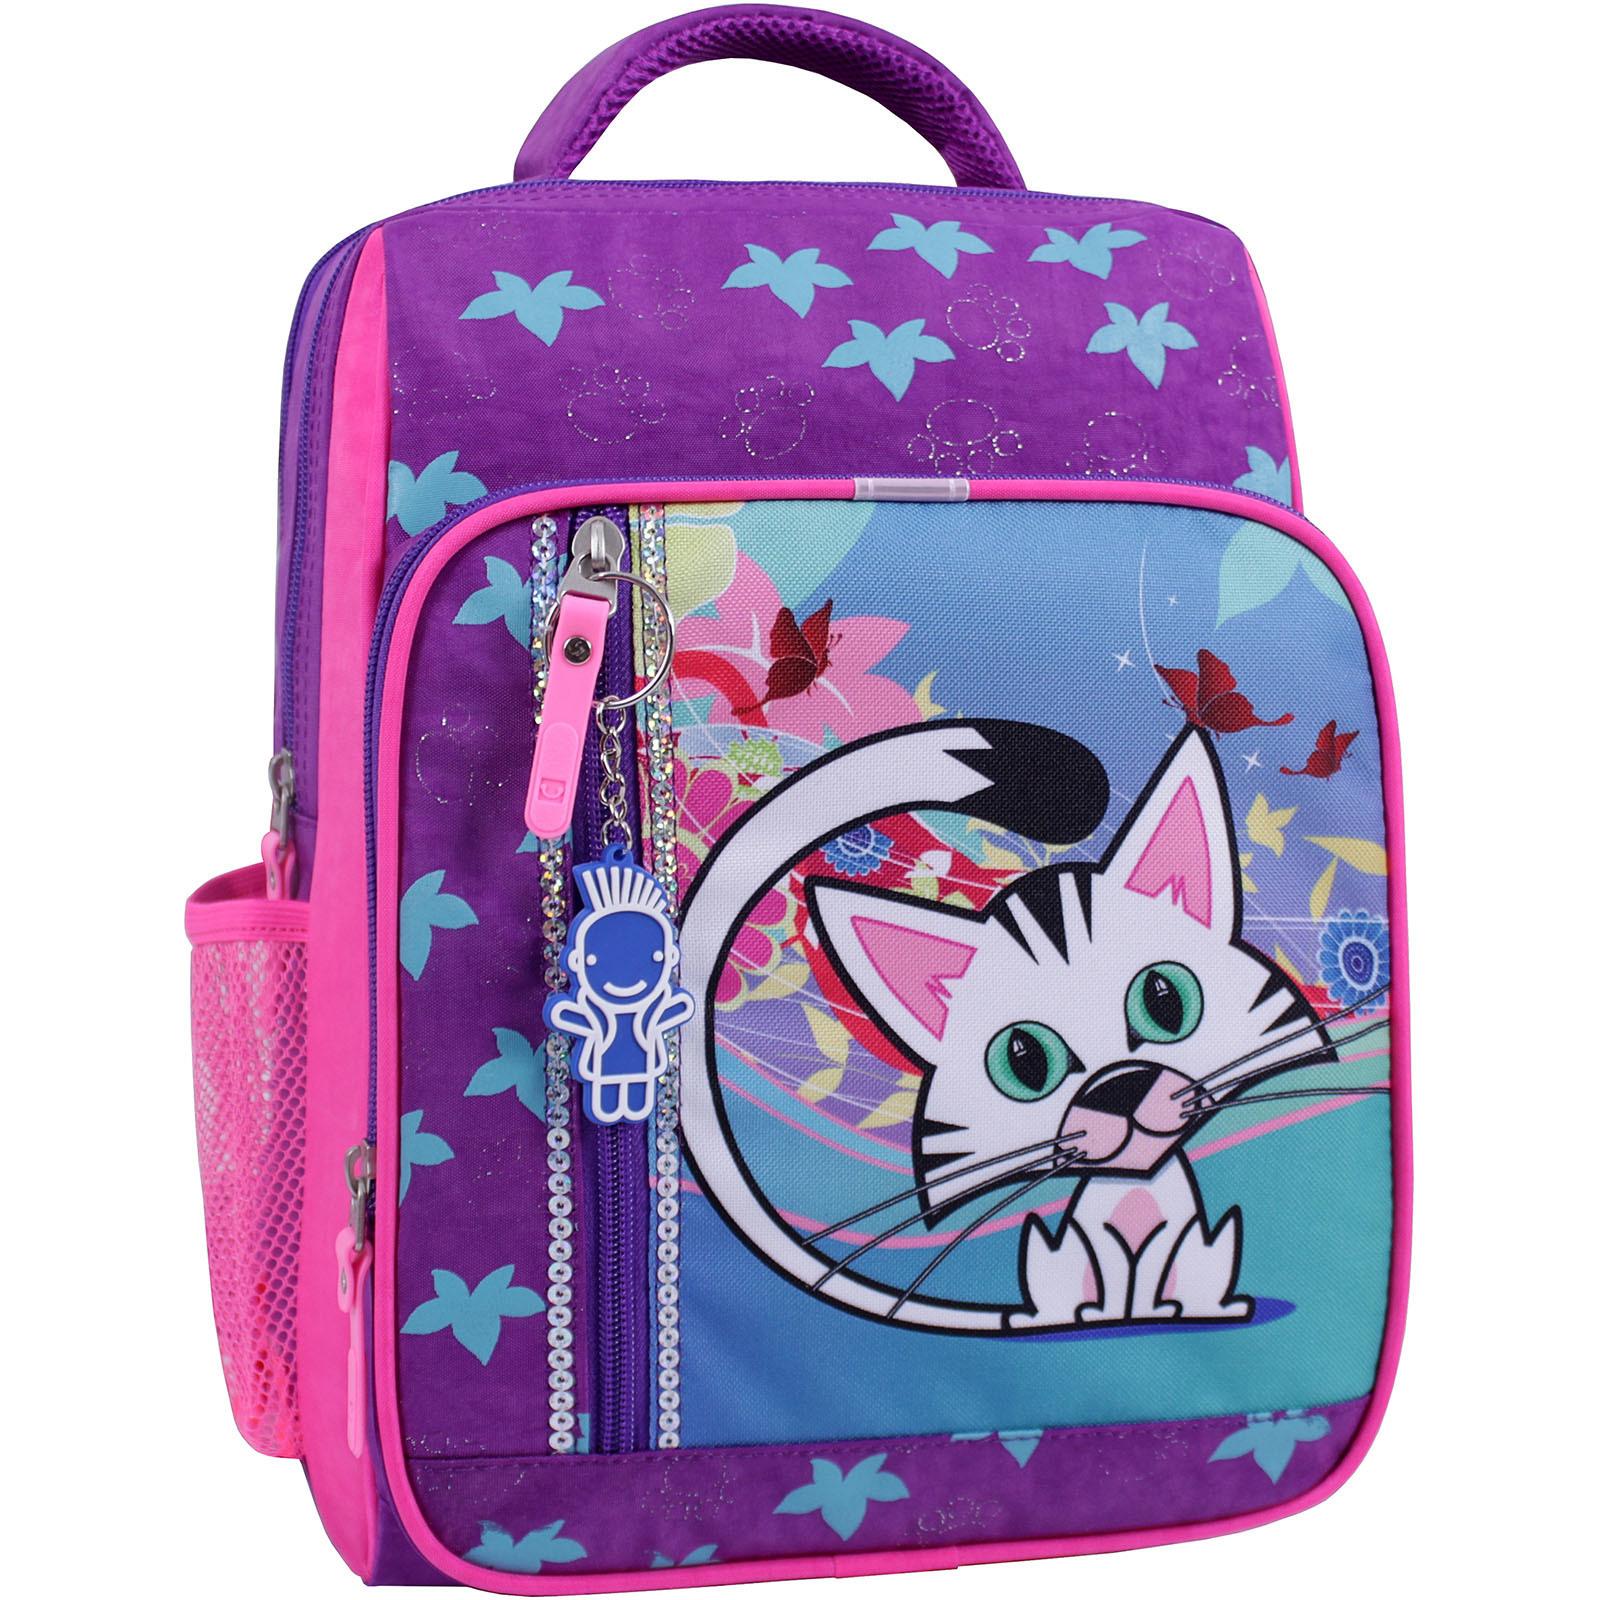 Школьные рюкзаки Рюкзак школьный Bagland Школьник 8 л. Фиолетовый 502 (00112702) IMG_1578_суб.502_.JPG